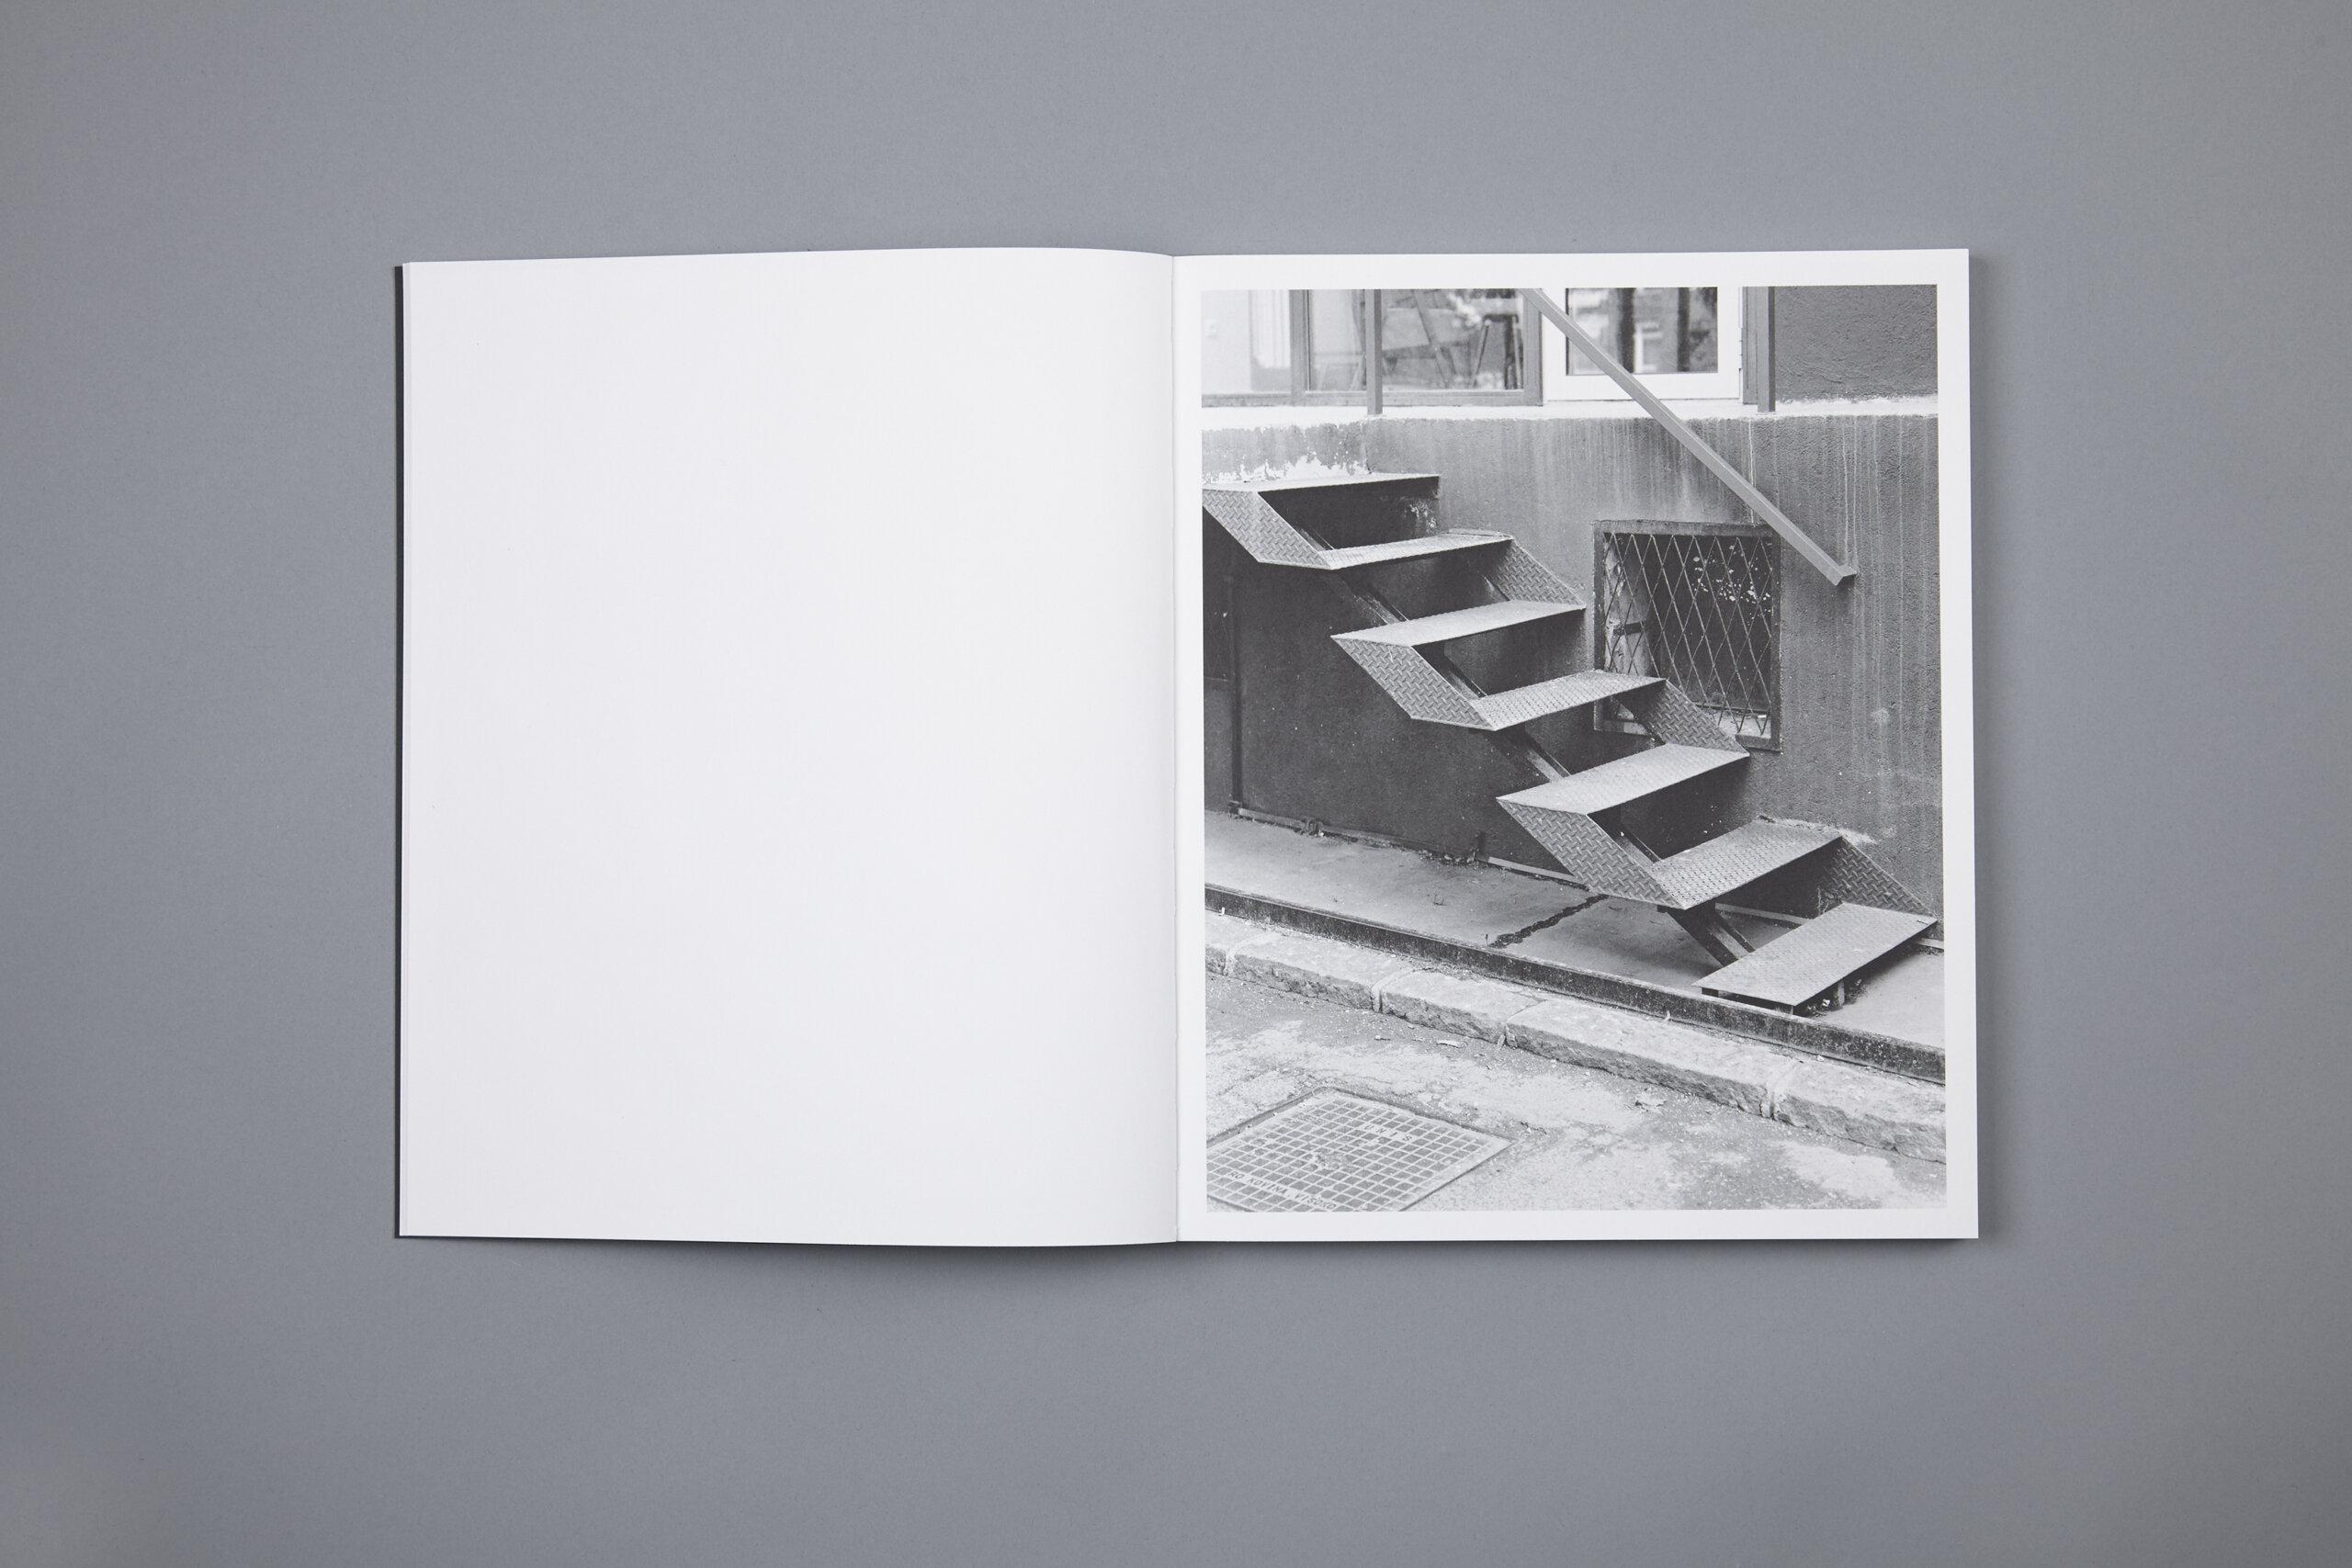 cavalier-bertrand-concrete-doesnt-burn-delpire-co